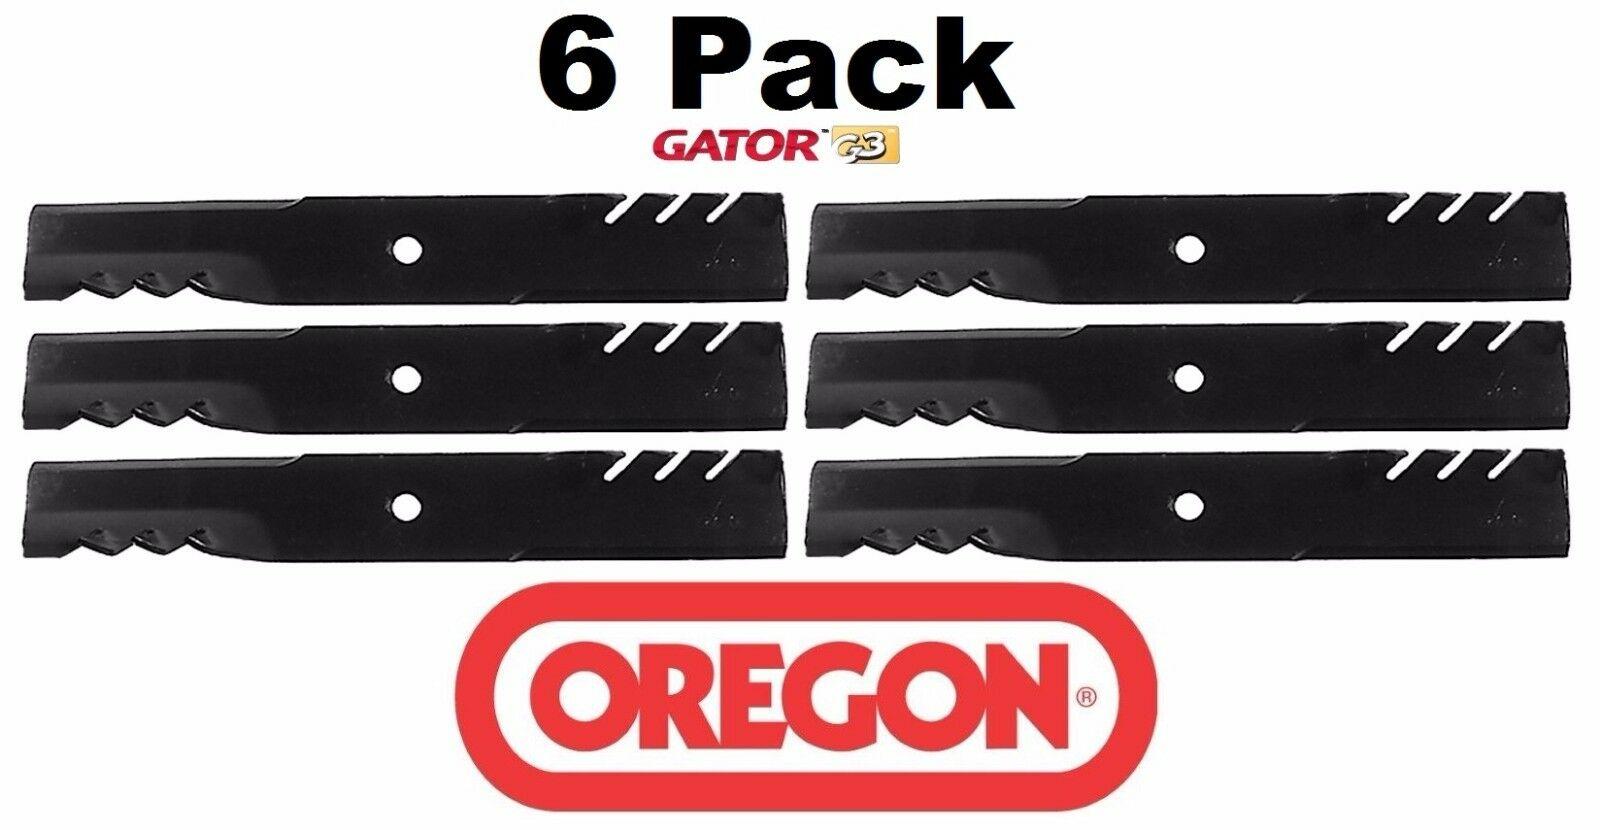 "3 Pack Oregon 396-769 G6 Gator Mulch Blade fits John Deere M144652 M164016 54/"" Z"